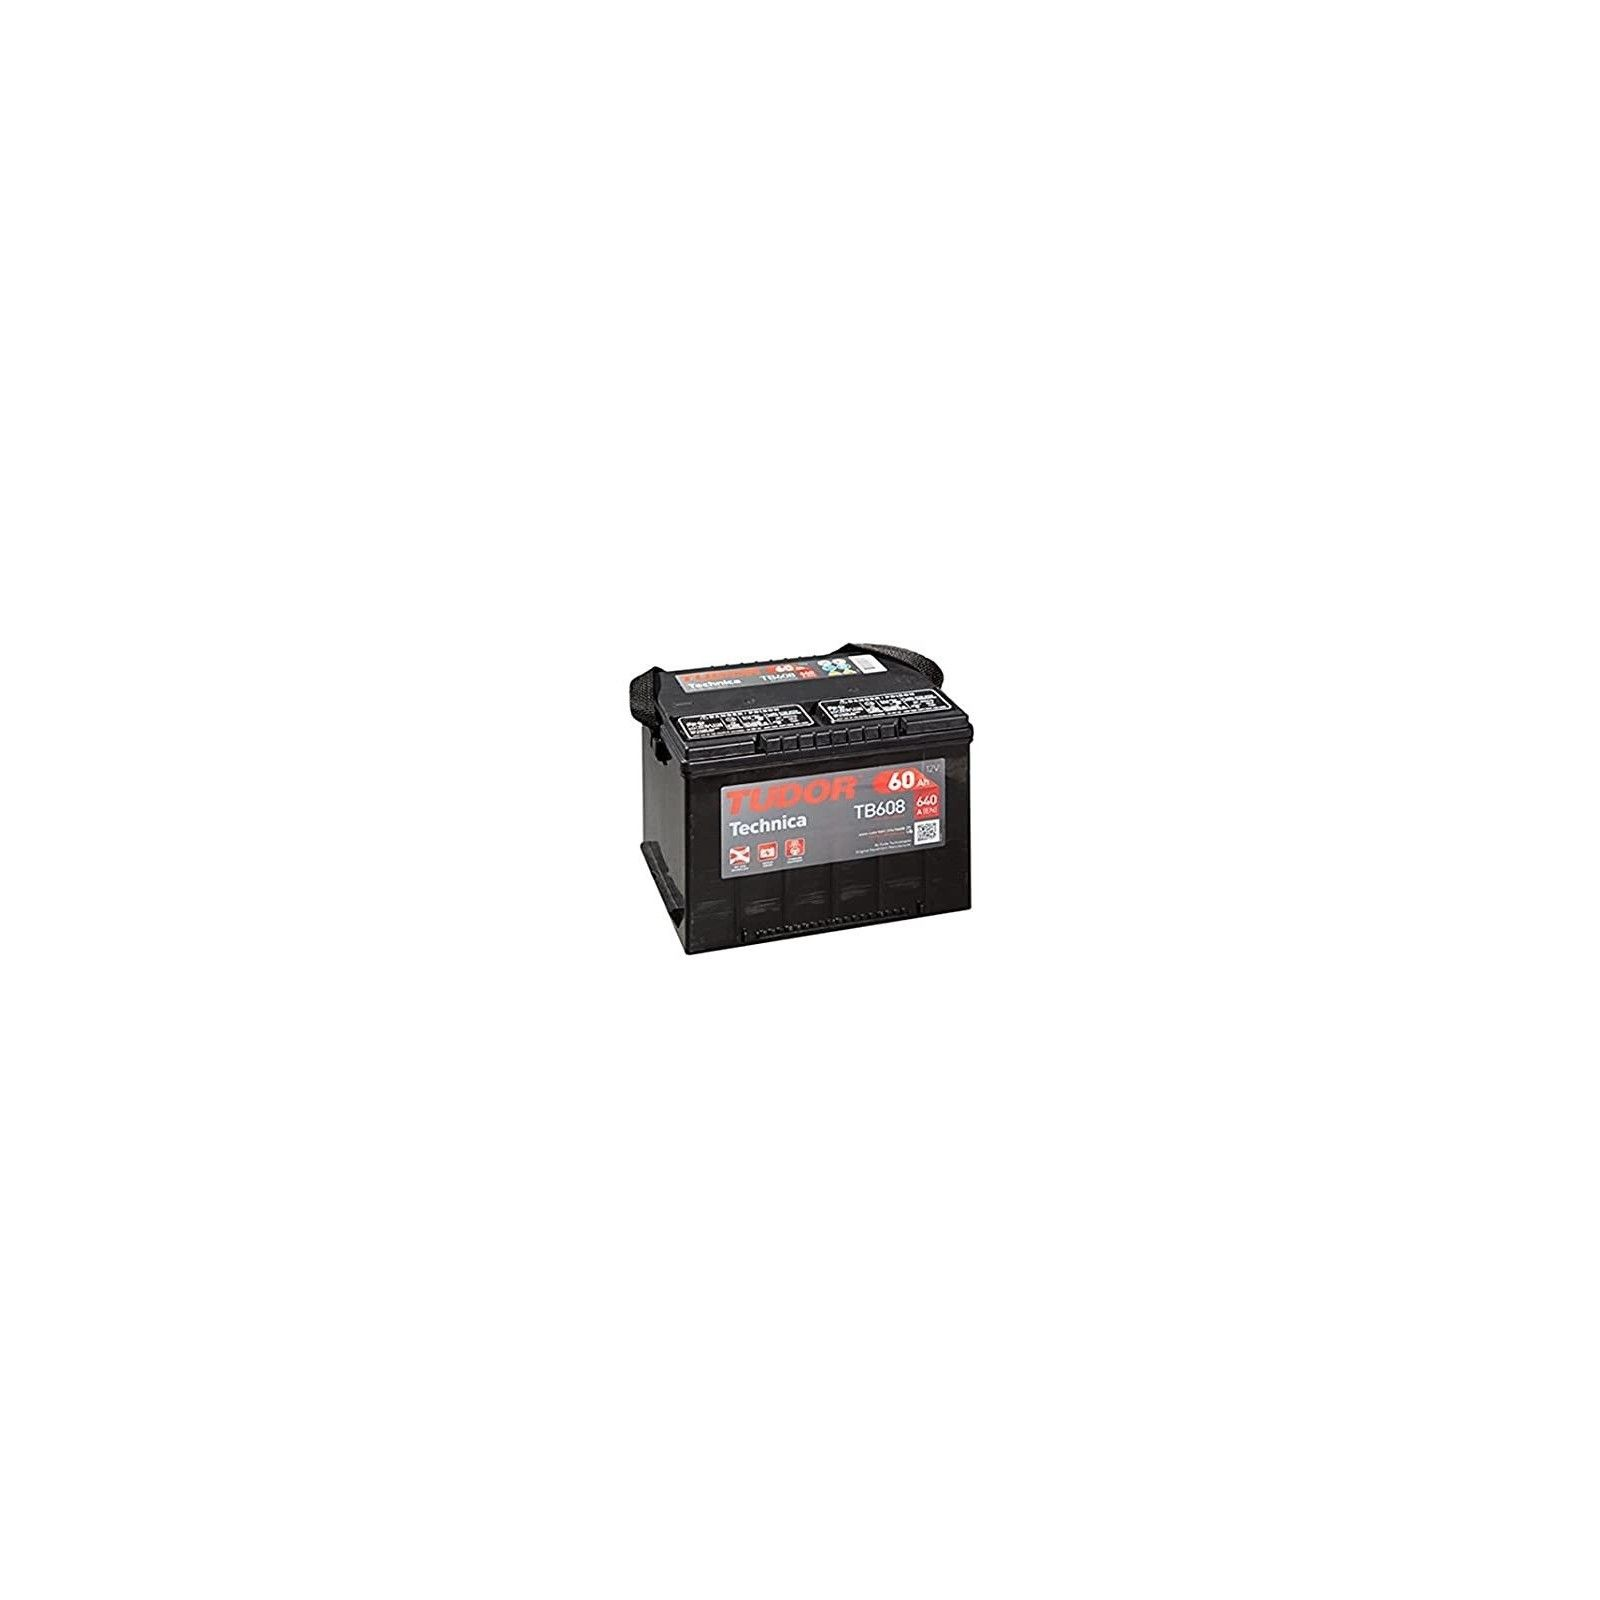 Batería Exide TB608 60Ah 640A 12V EXIDE - 1